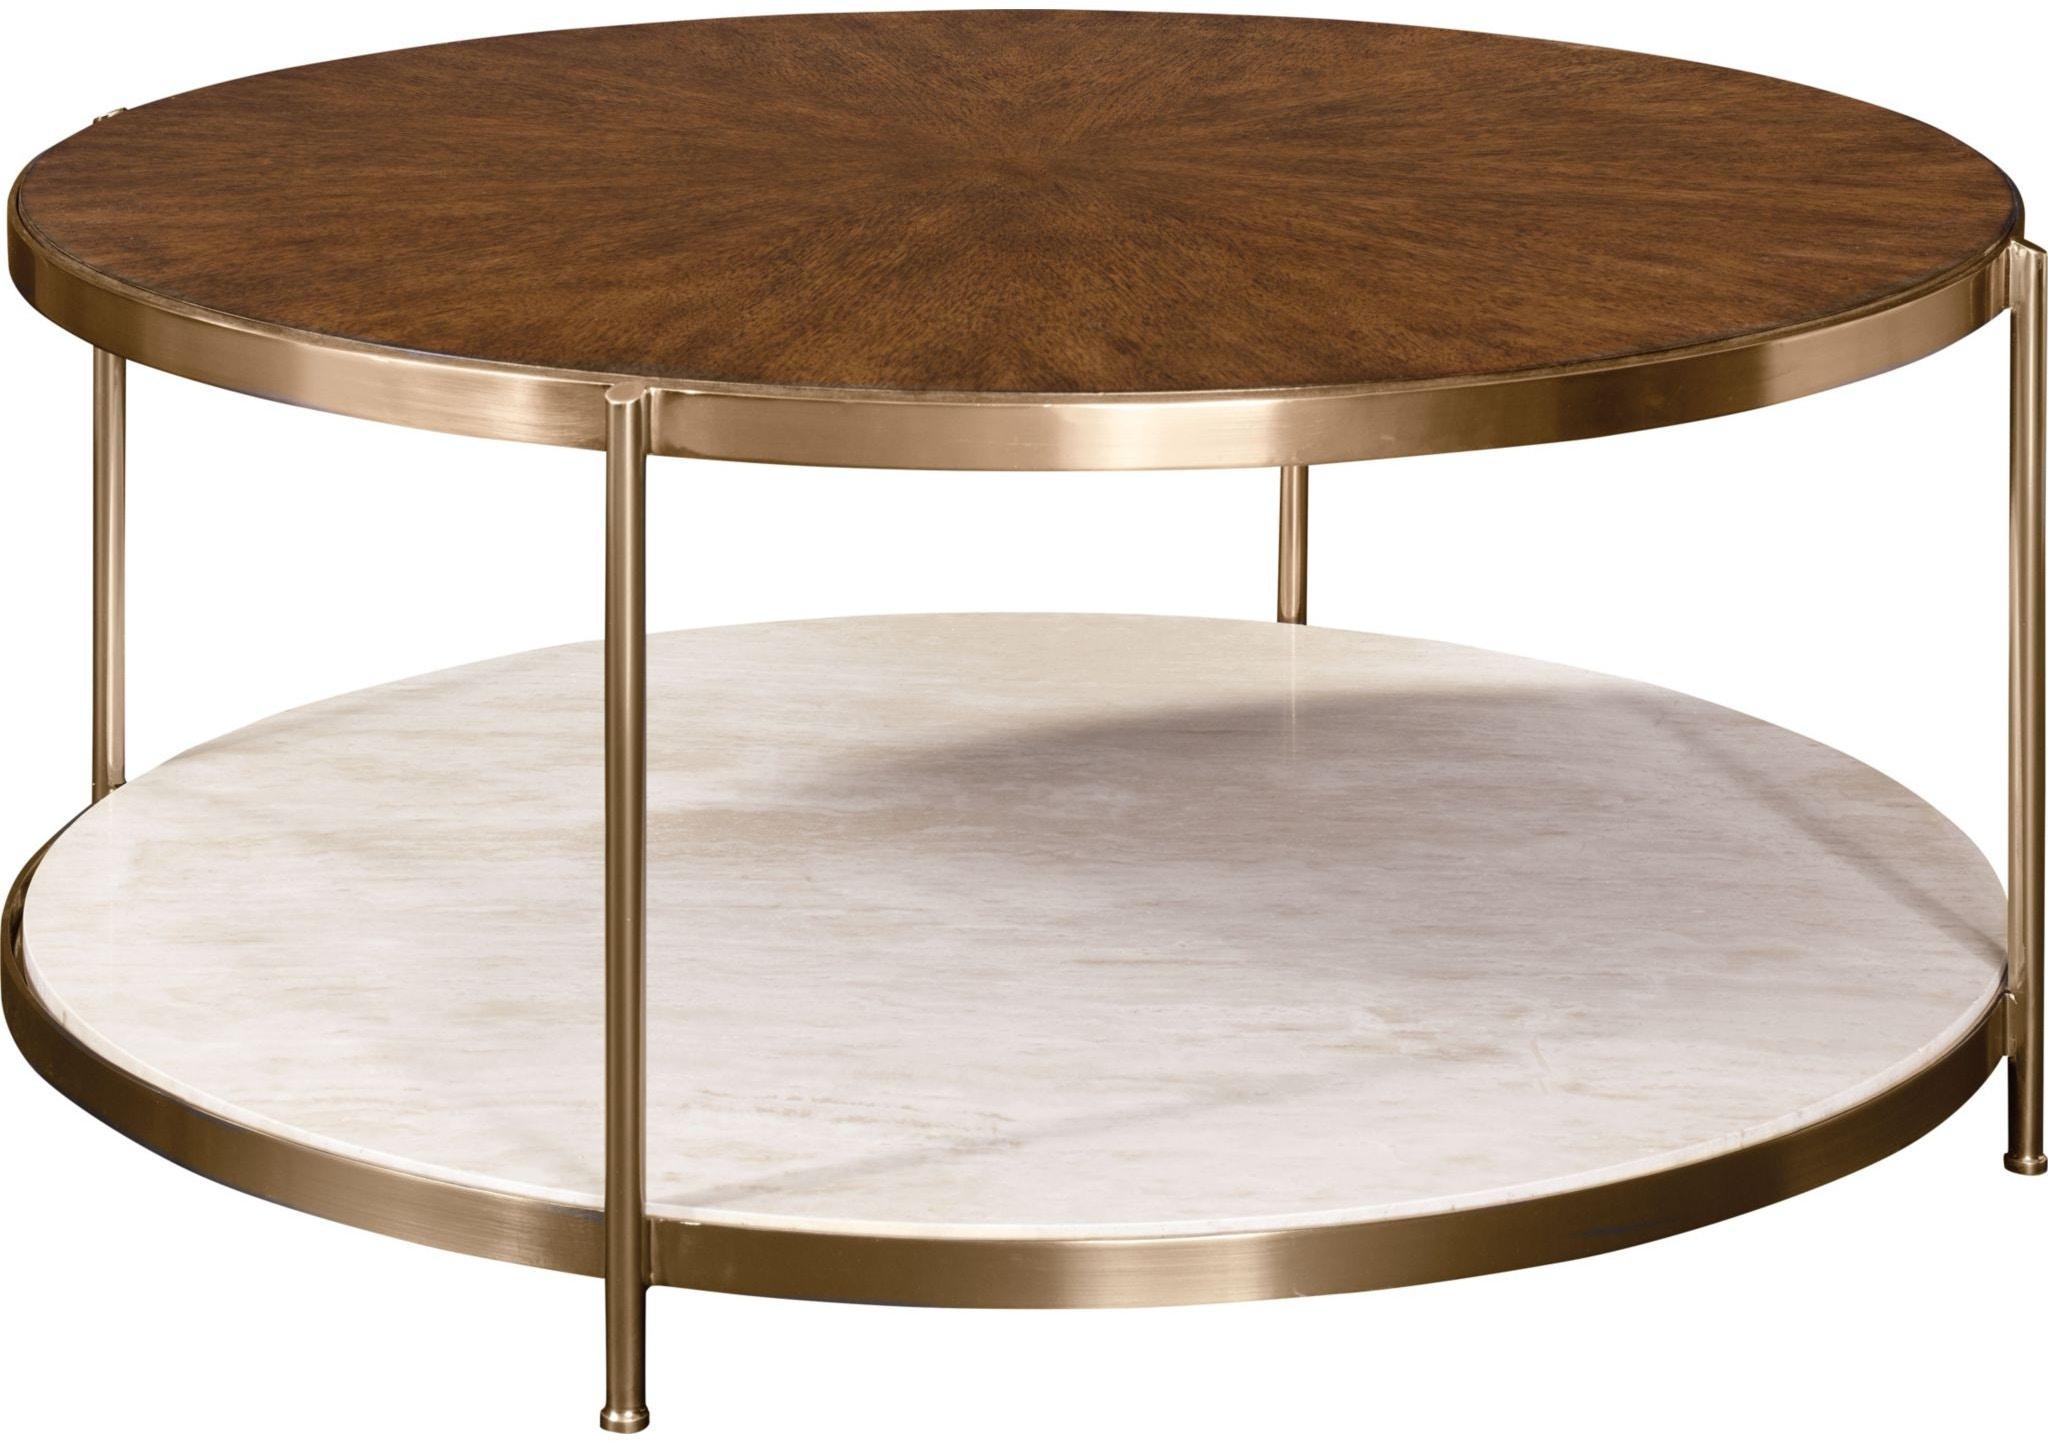 Thomasville Brigid Round Cocktail Table 172